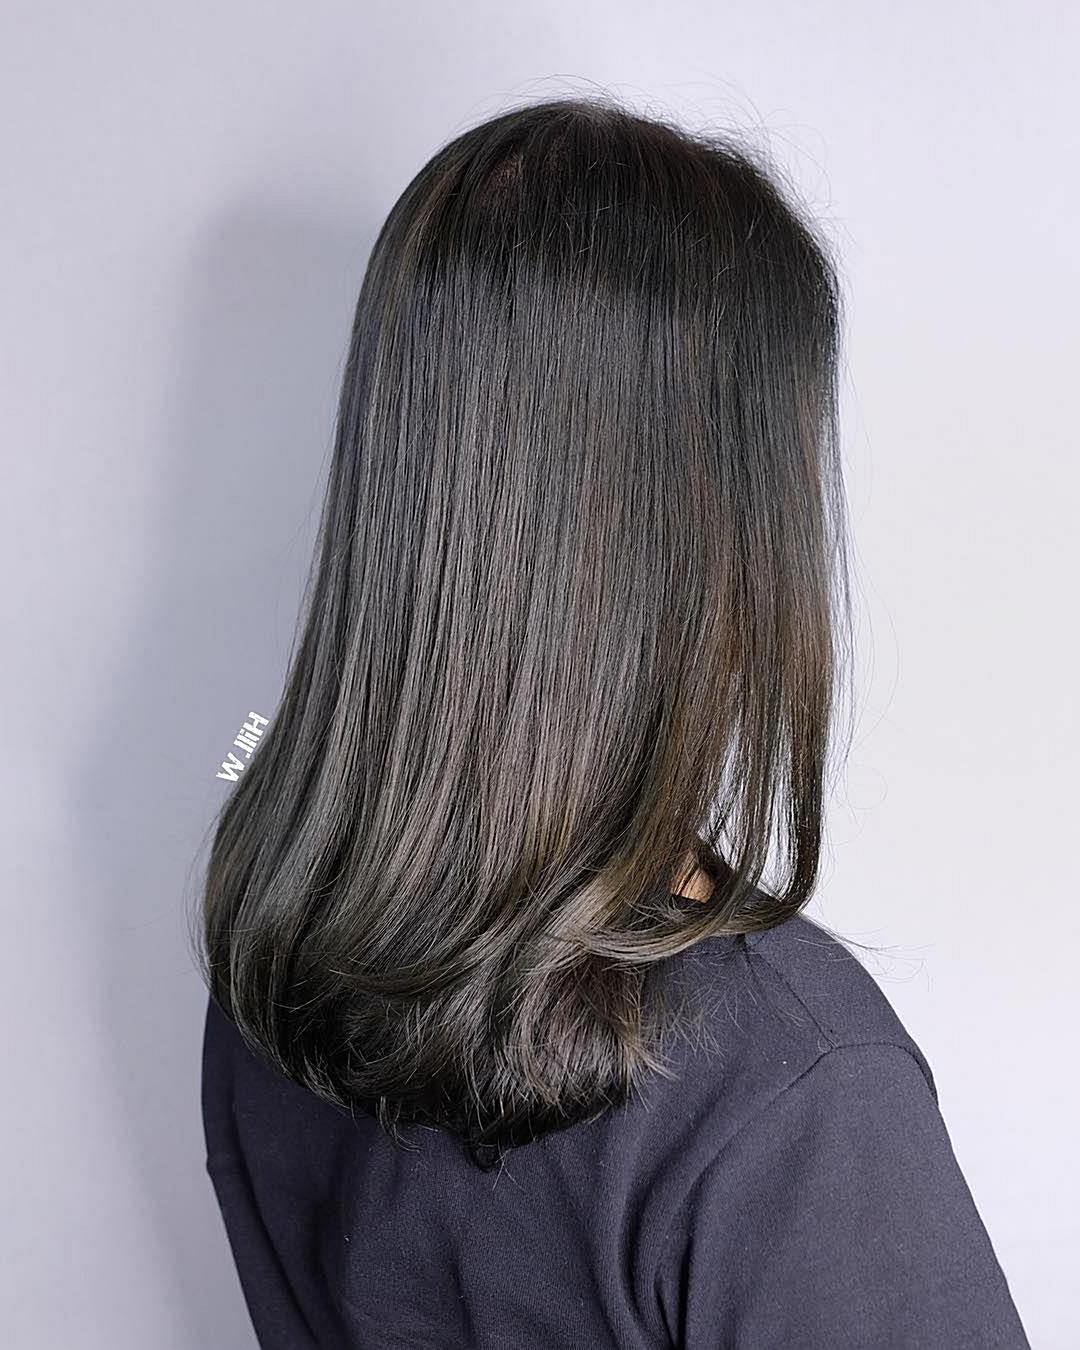 [New] The 10 Best Hairstyles (with Pictures) -  . 不用漂!No Need Bleach! . 啞灰綠 最近新調出一隻唔漂又比較接近灰灰地嘅顏色好多客人整完都好開心好滿意陽光下仲更加靚添 . 近期愛上唔漂又可以調